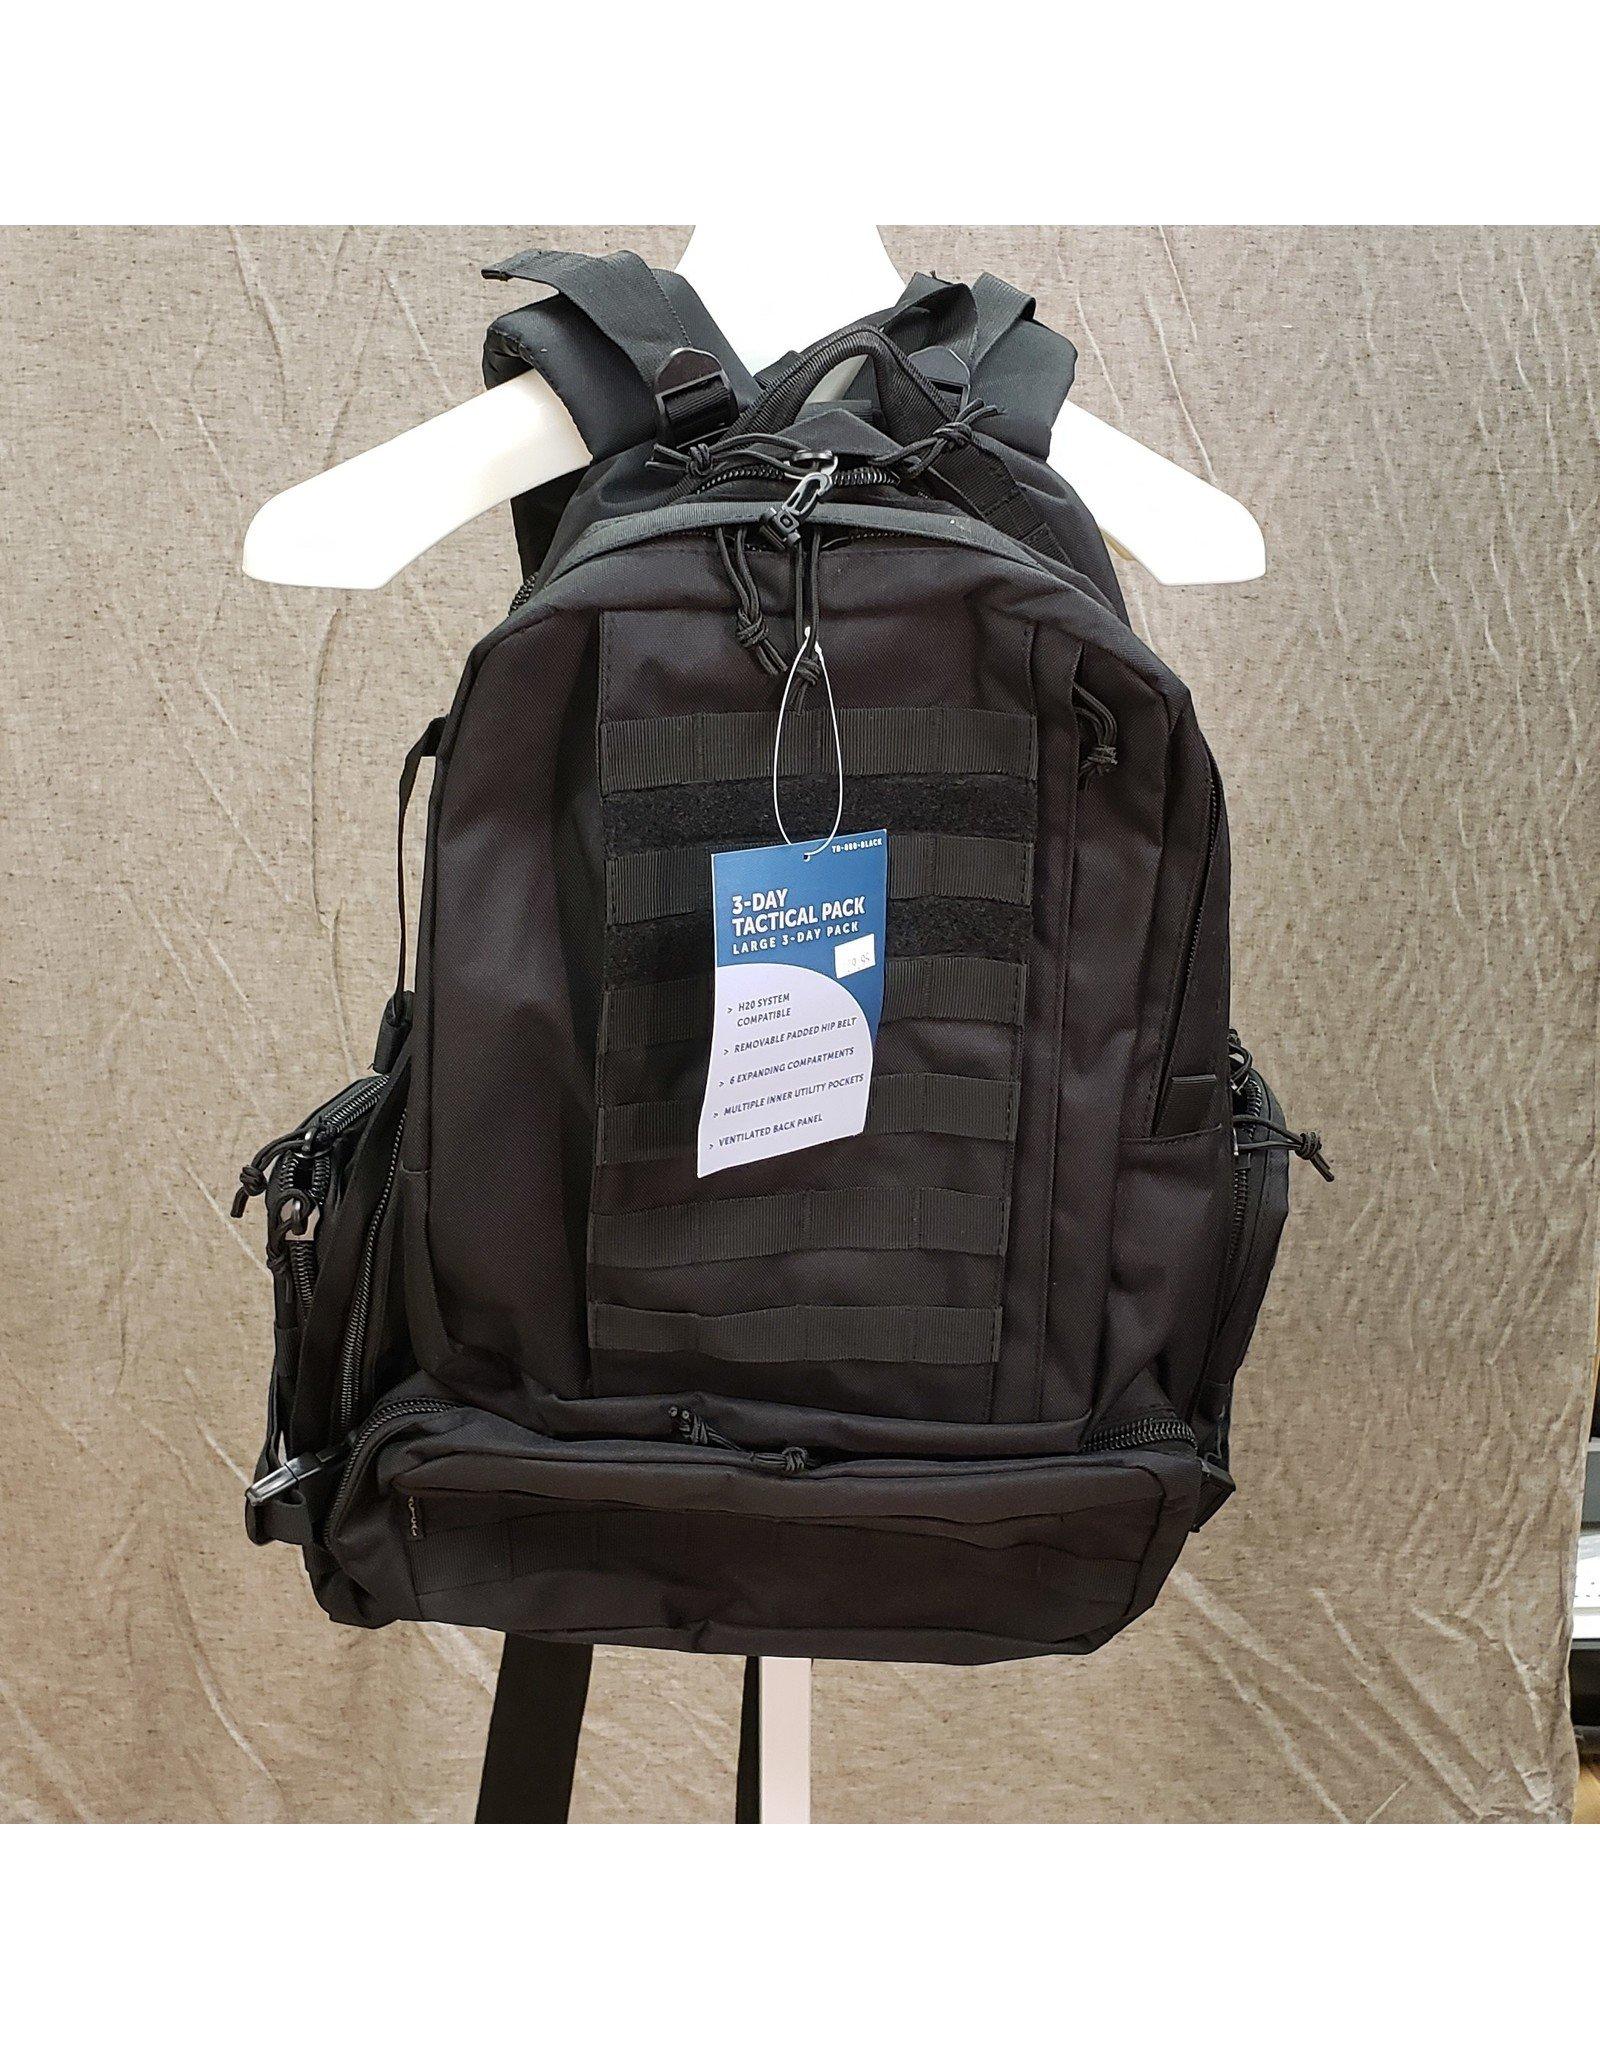 LARGE 3 DAY TACTICAL BAG-BLK - 85127